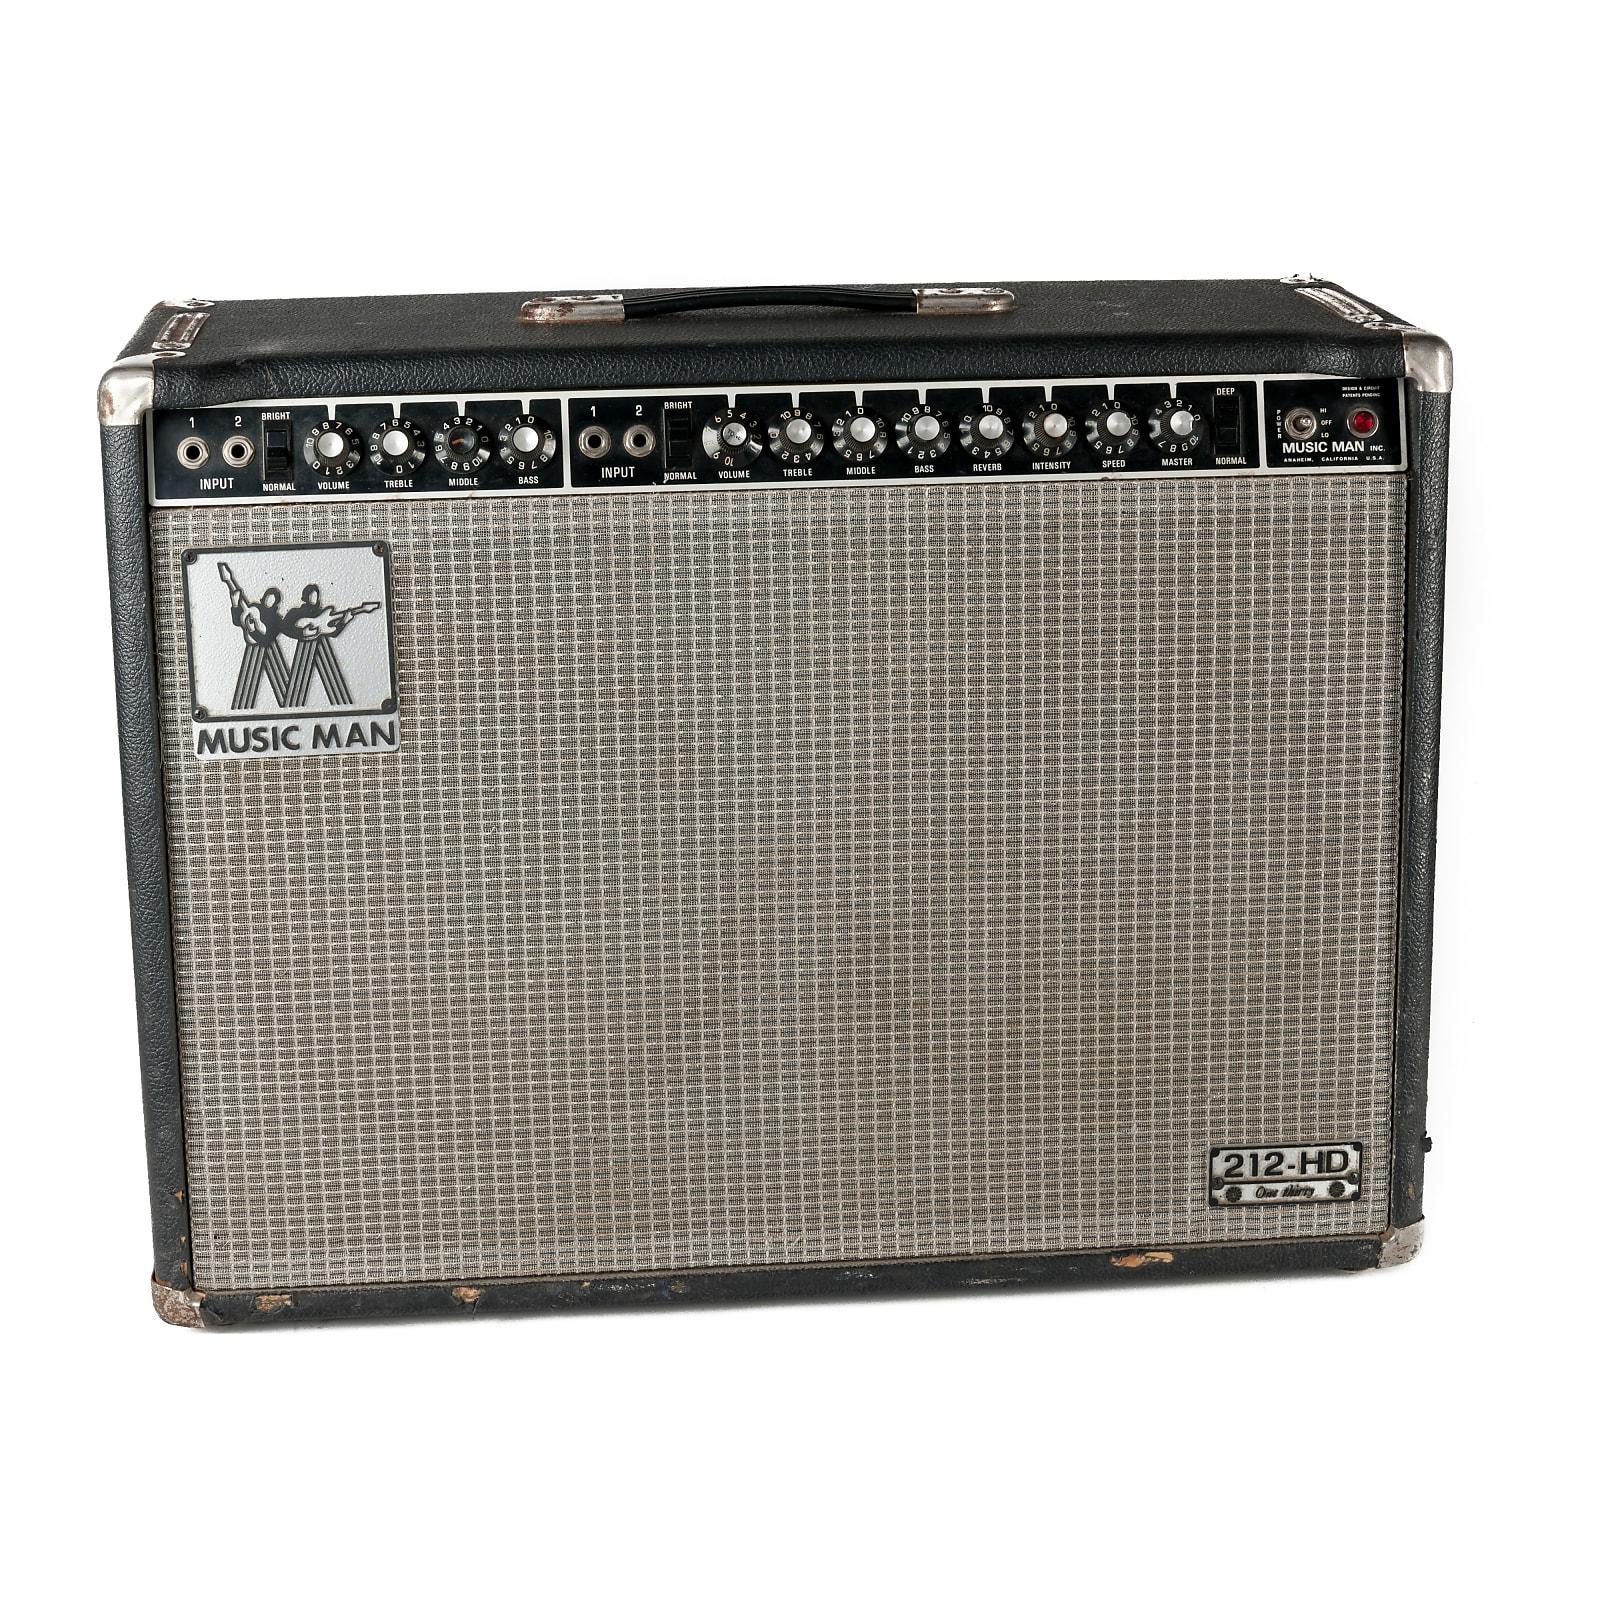 "Music Man 212-HD One Thirty 2-Channel 130-Watt 2x12"" Guitar Combo 1974 - 1979 | Reverb"